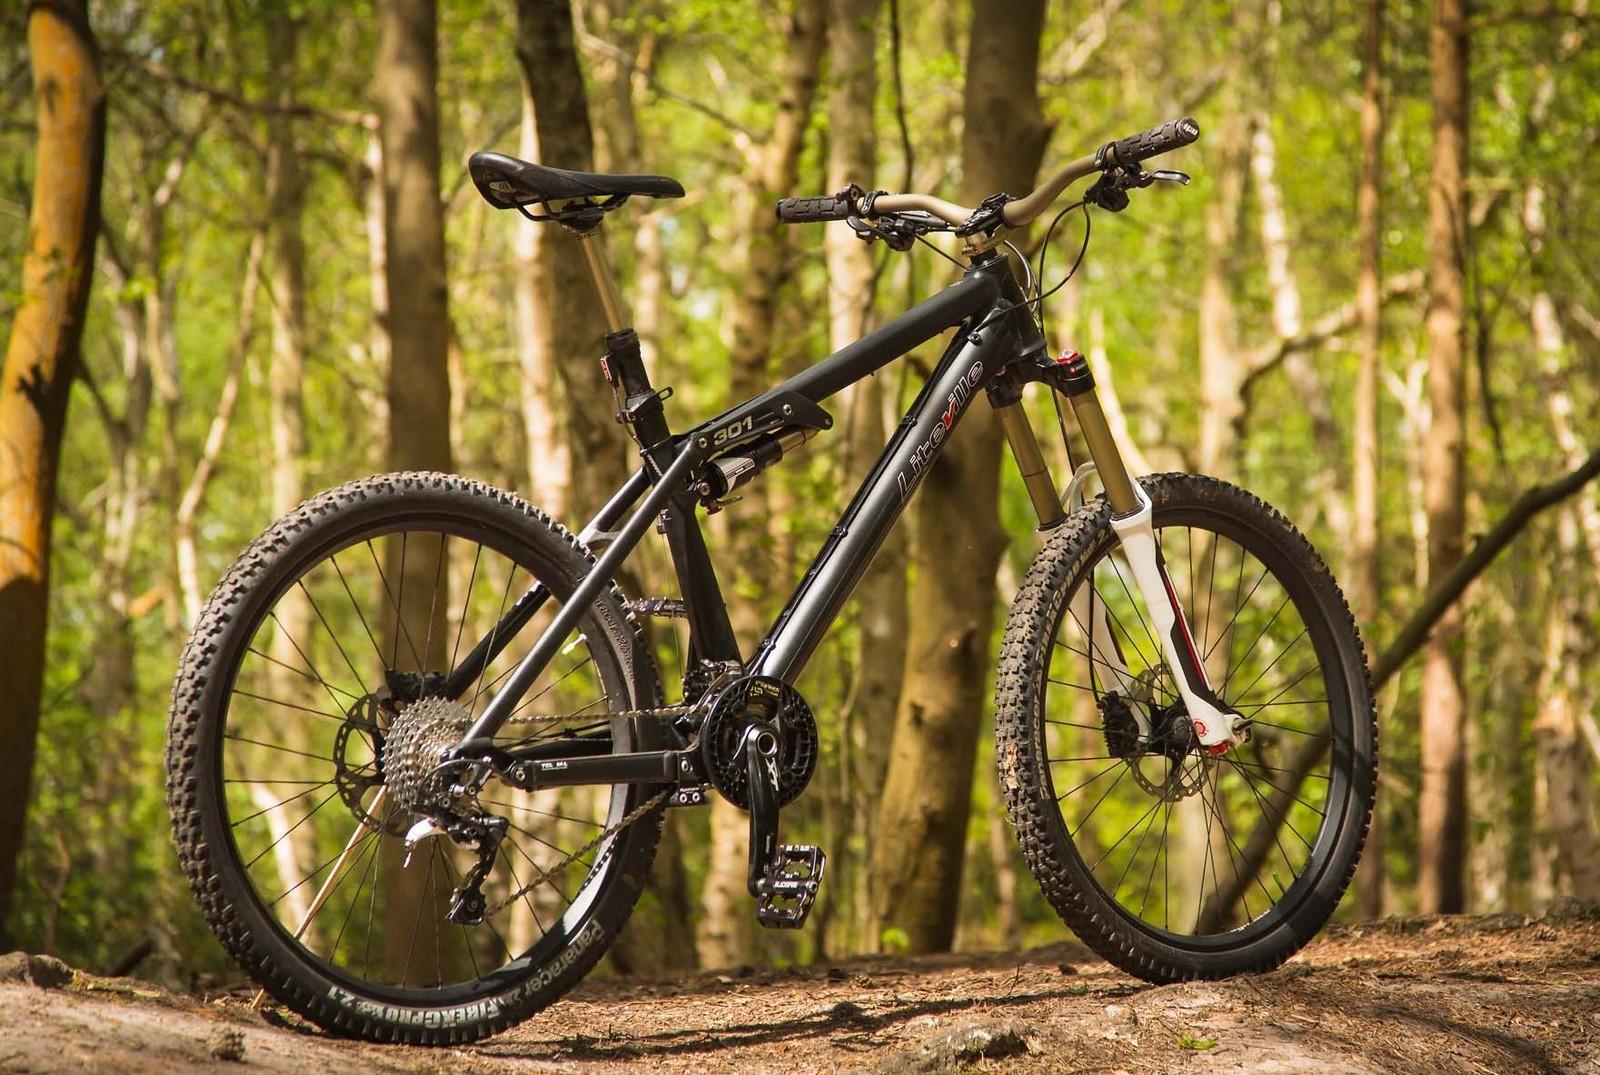 Liteville 301 mk11 m  2 - teknorob - Mountain Biking Pictures - Vital MTB